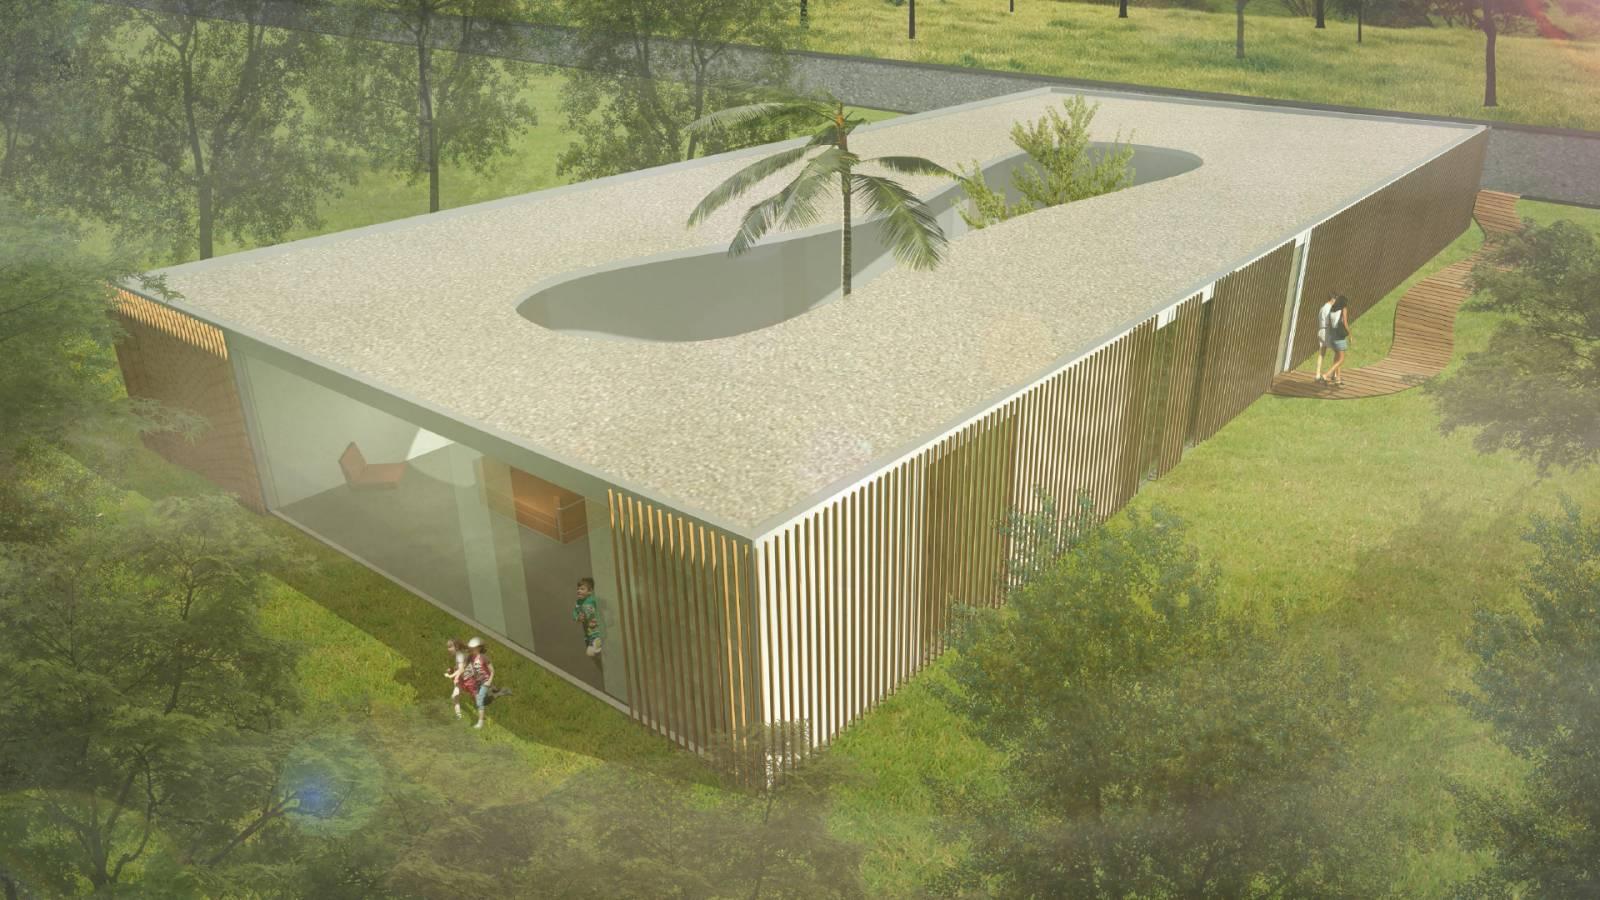 HOUSE #1 - EXTERIOR - 6 case study houses - SPOL Architects